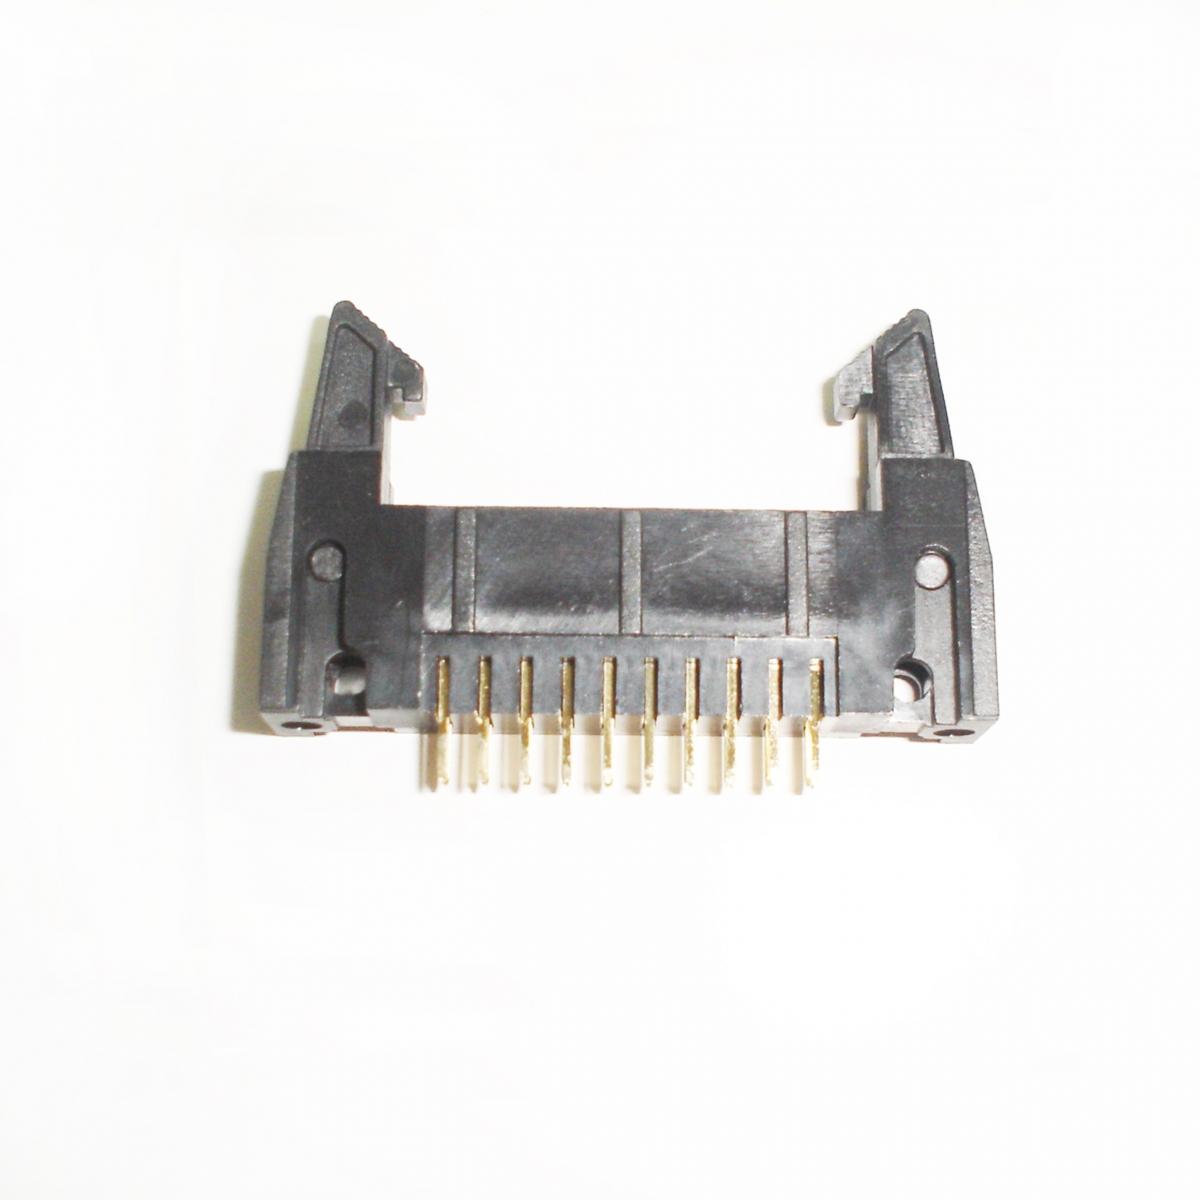 LATCH IDCEC-20 MACHO C/ EJETOR 180 - METALTEX-